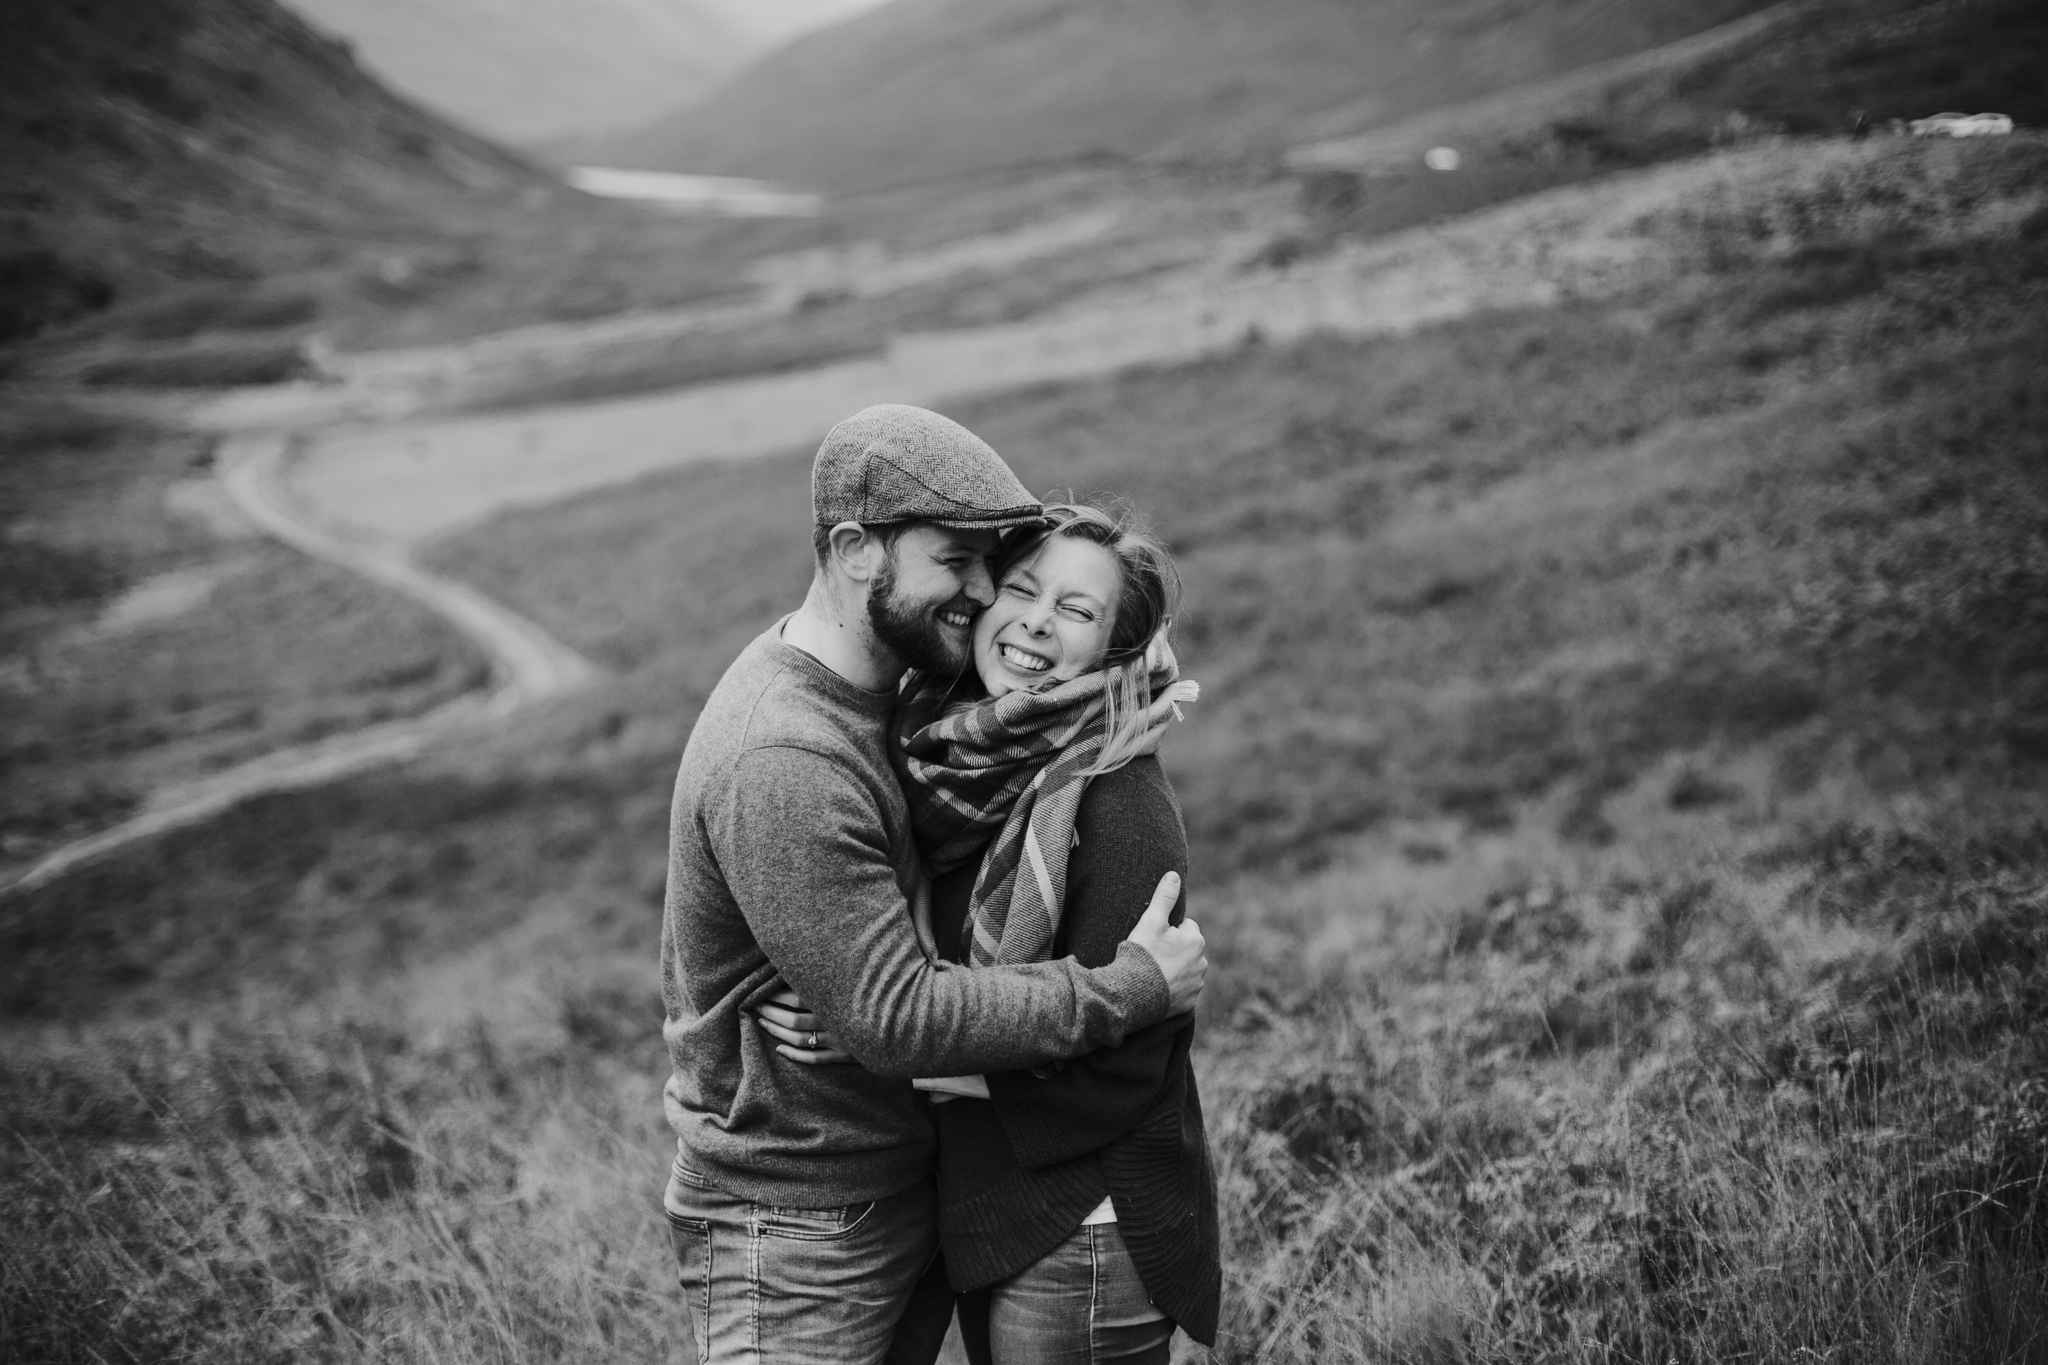 Anniversary photo shoot in the Scottish Highlands, Glencoe